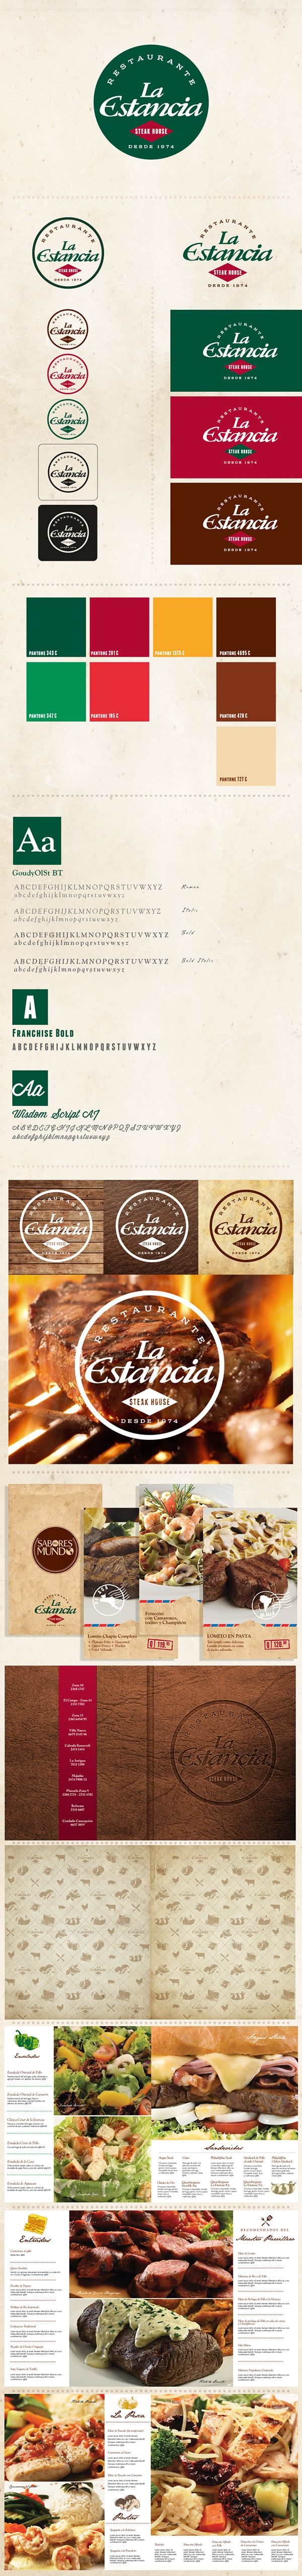 ReBranding La Estancia on Behance